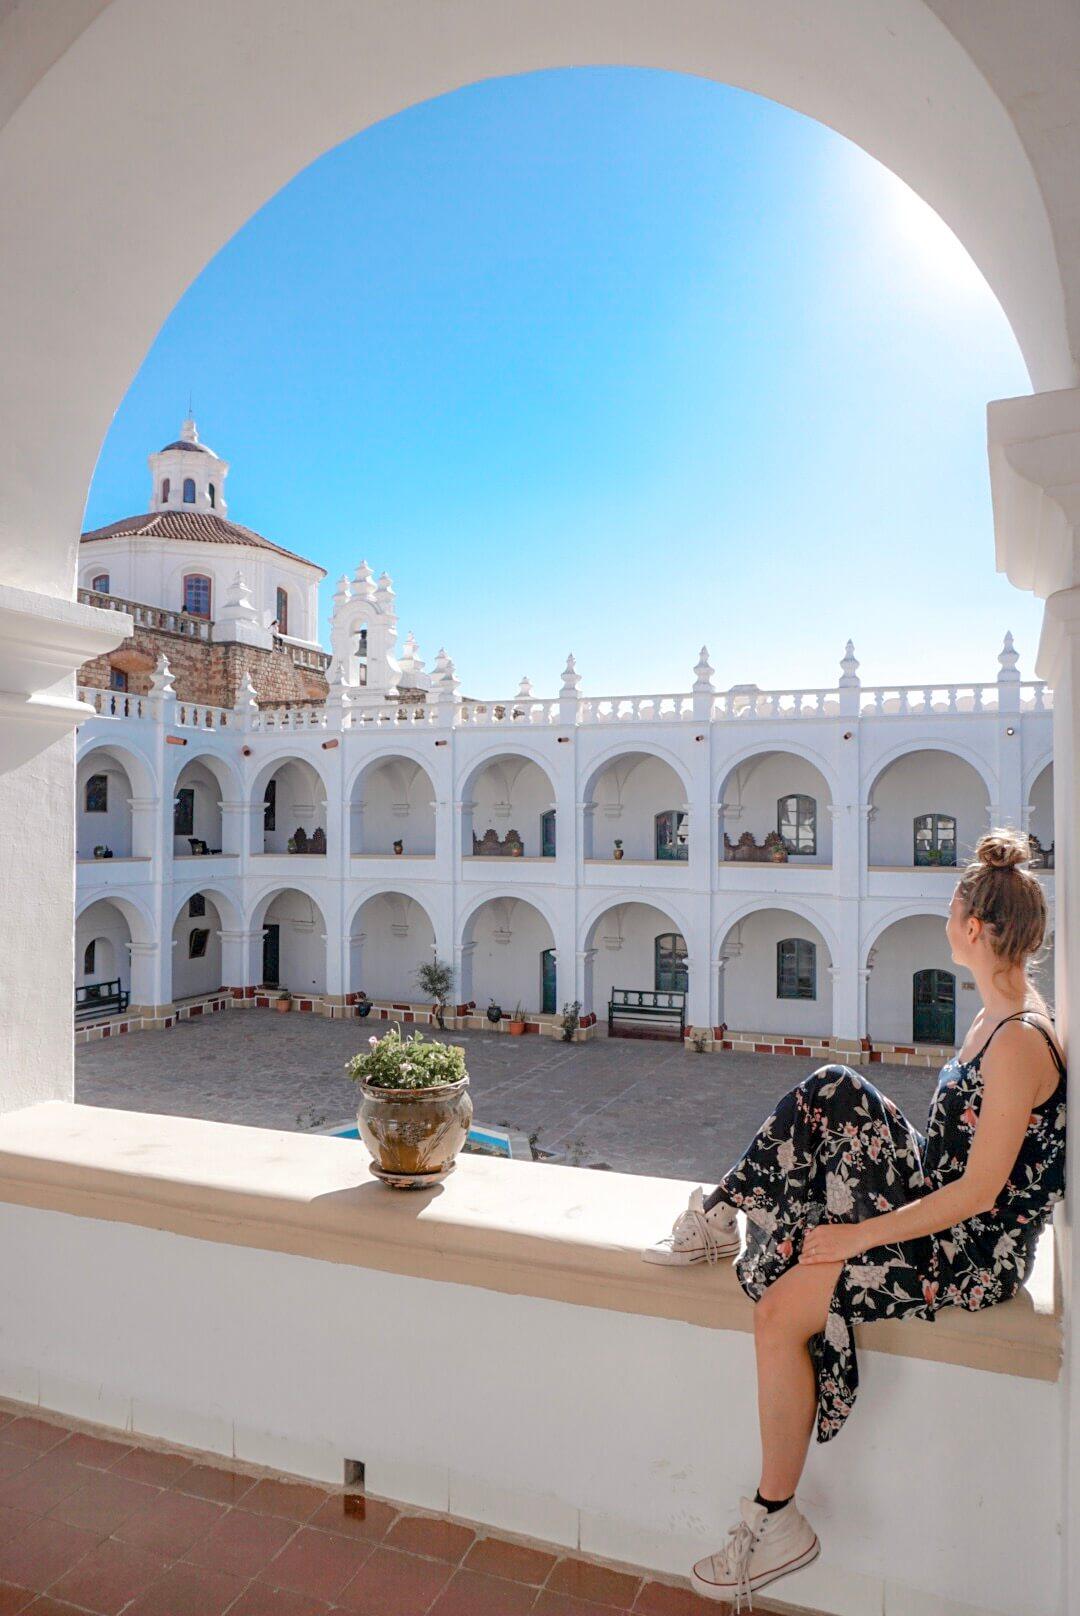 visiter couvent iglesia san felipe de neri sucre bolivie